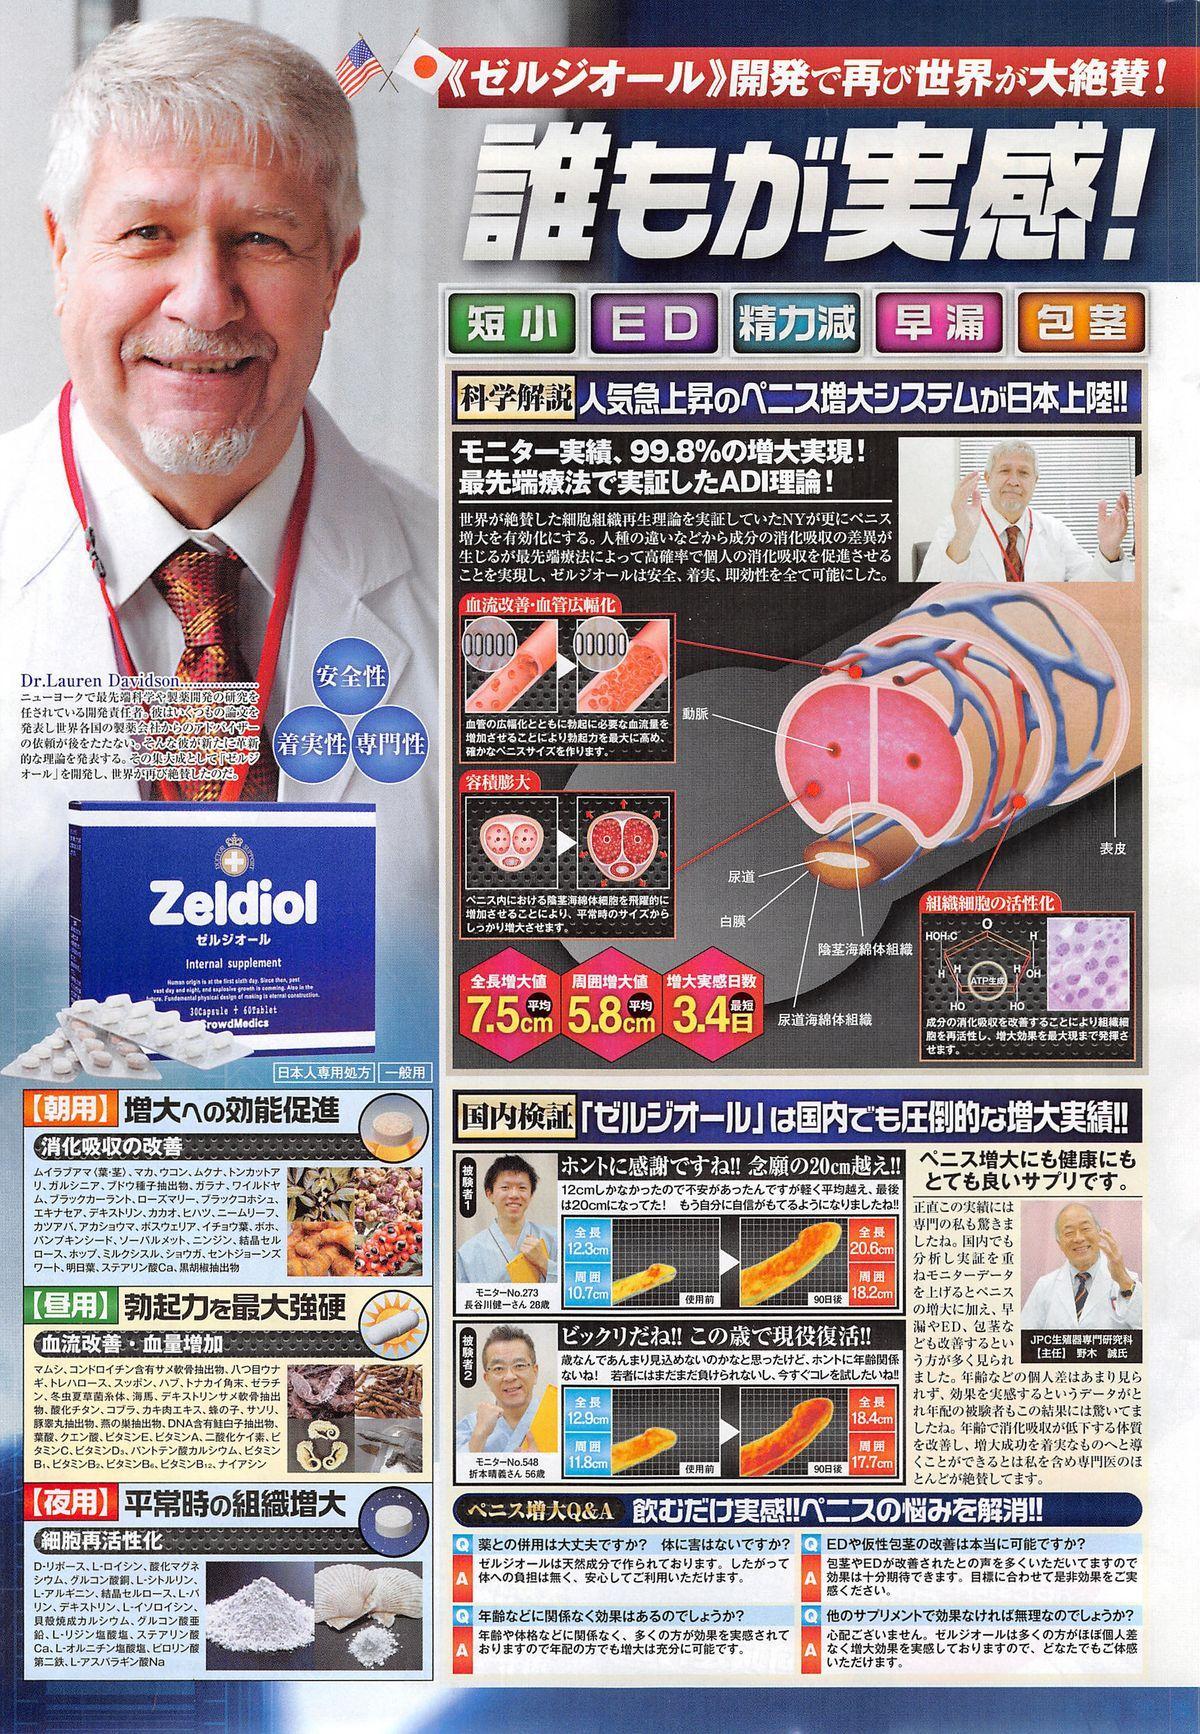 COMIC Penguin Club Sanzokuban 2014-12 240